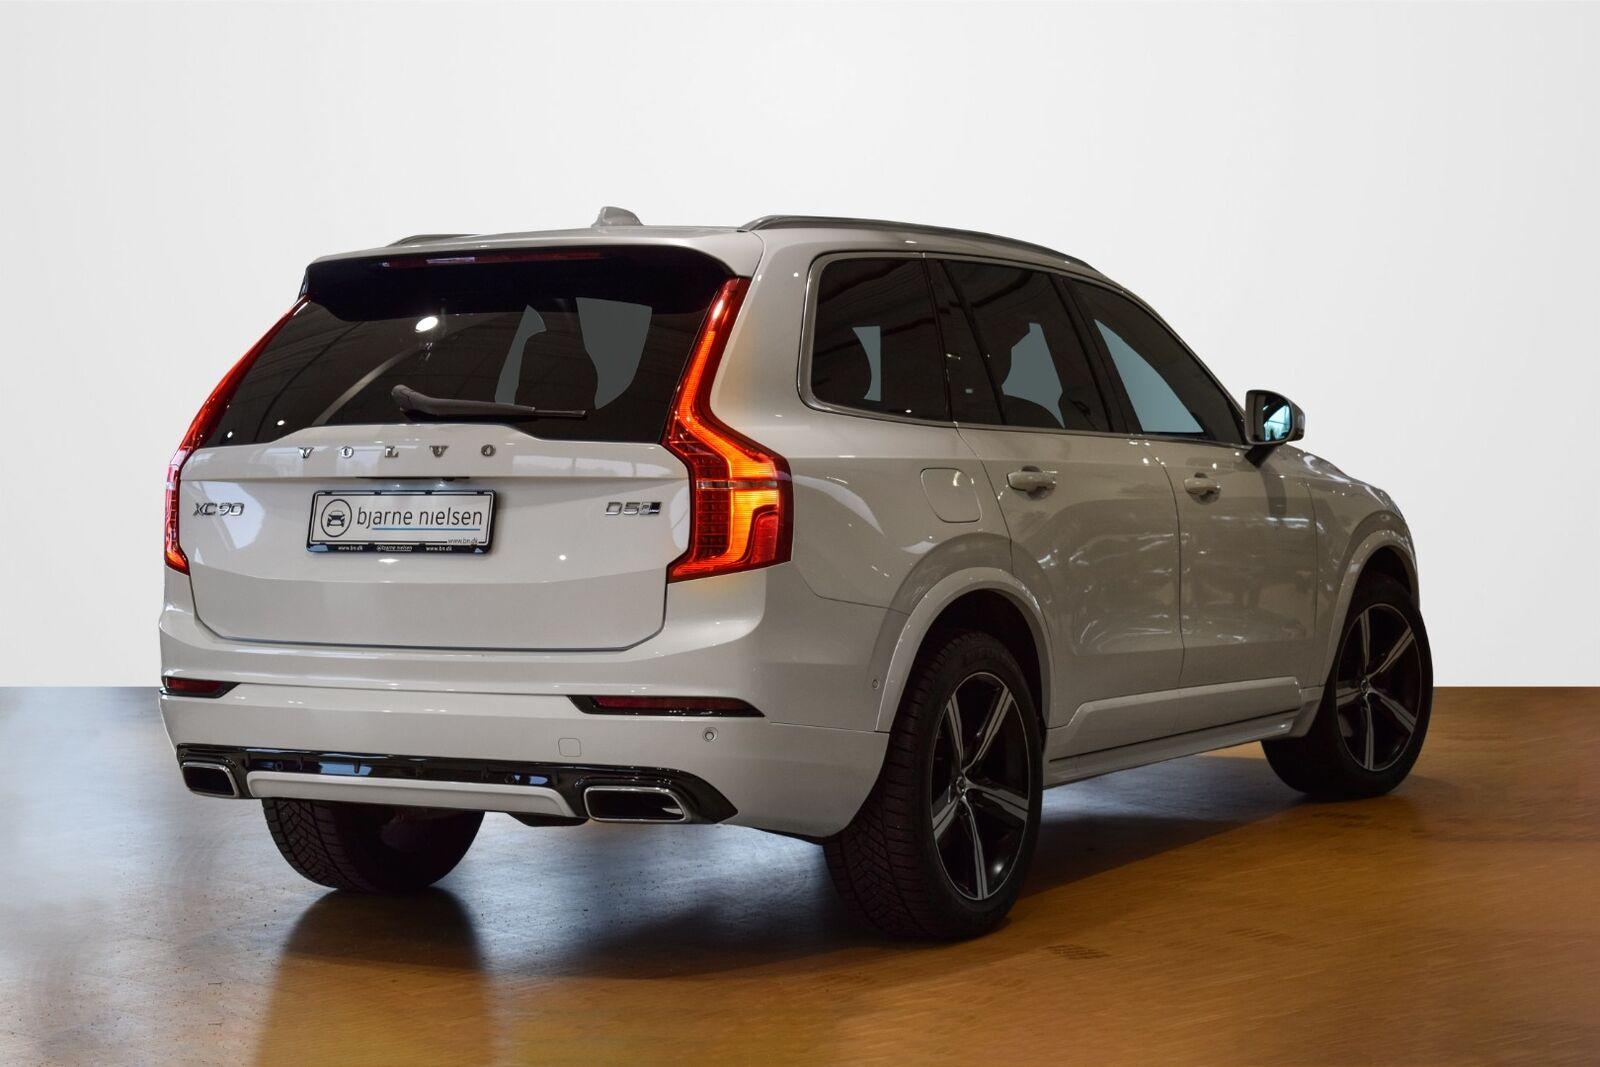 Volvo XC90 2,0 D5 225 R-Design aut. AWD 7prs - billede 2